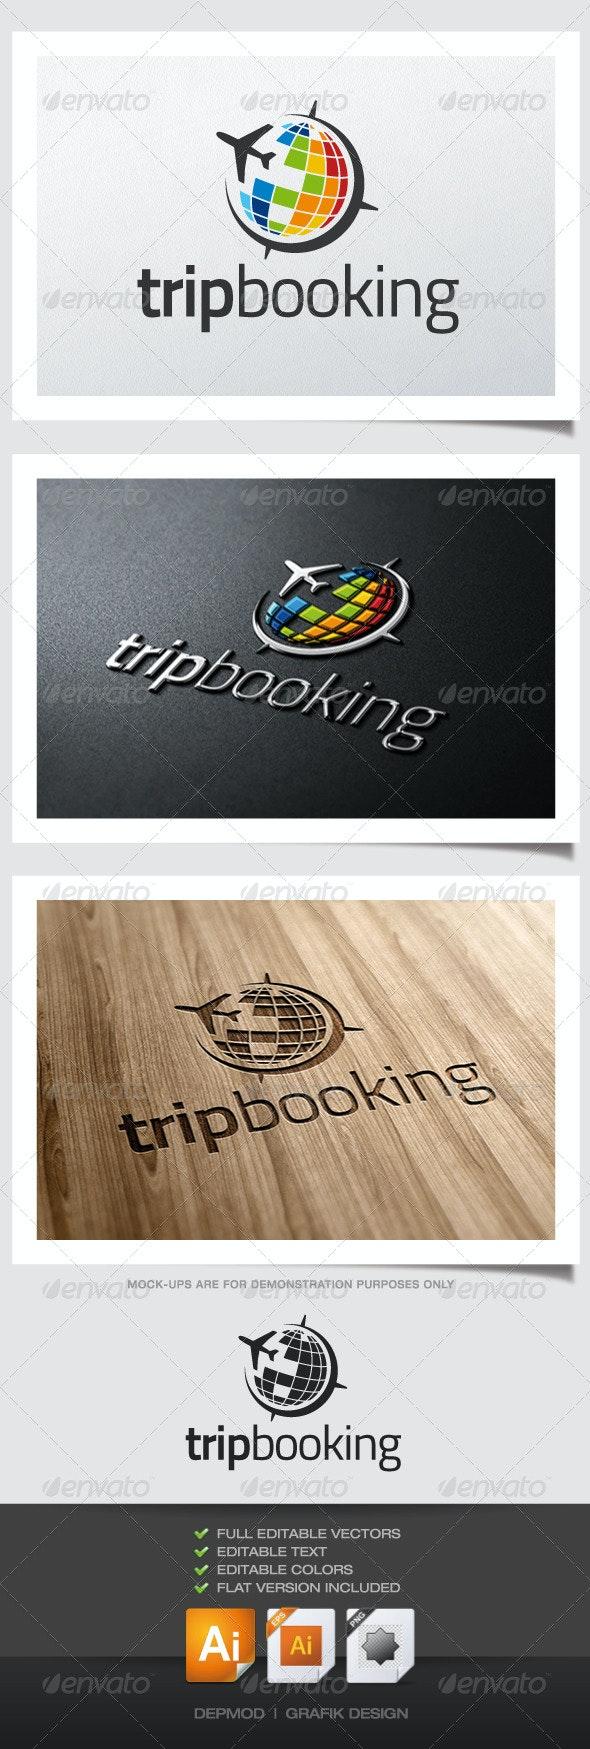 Trip Booking Logo - Symbols Logo Templates